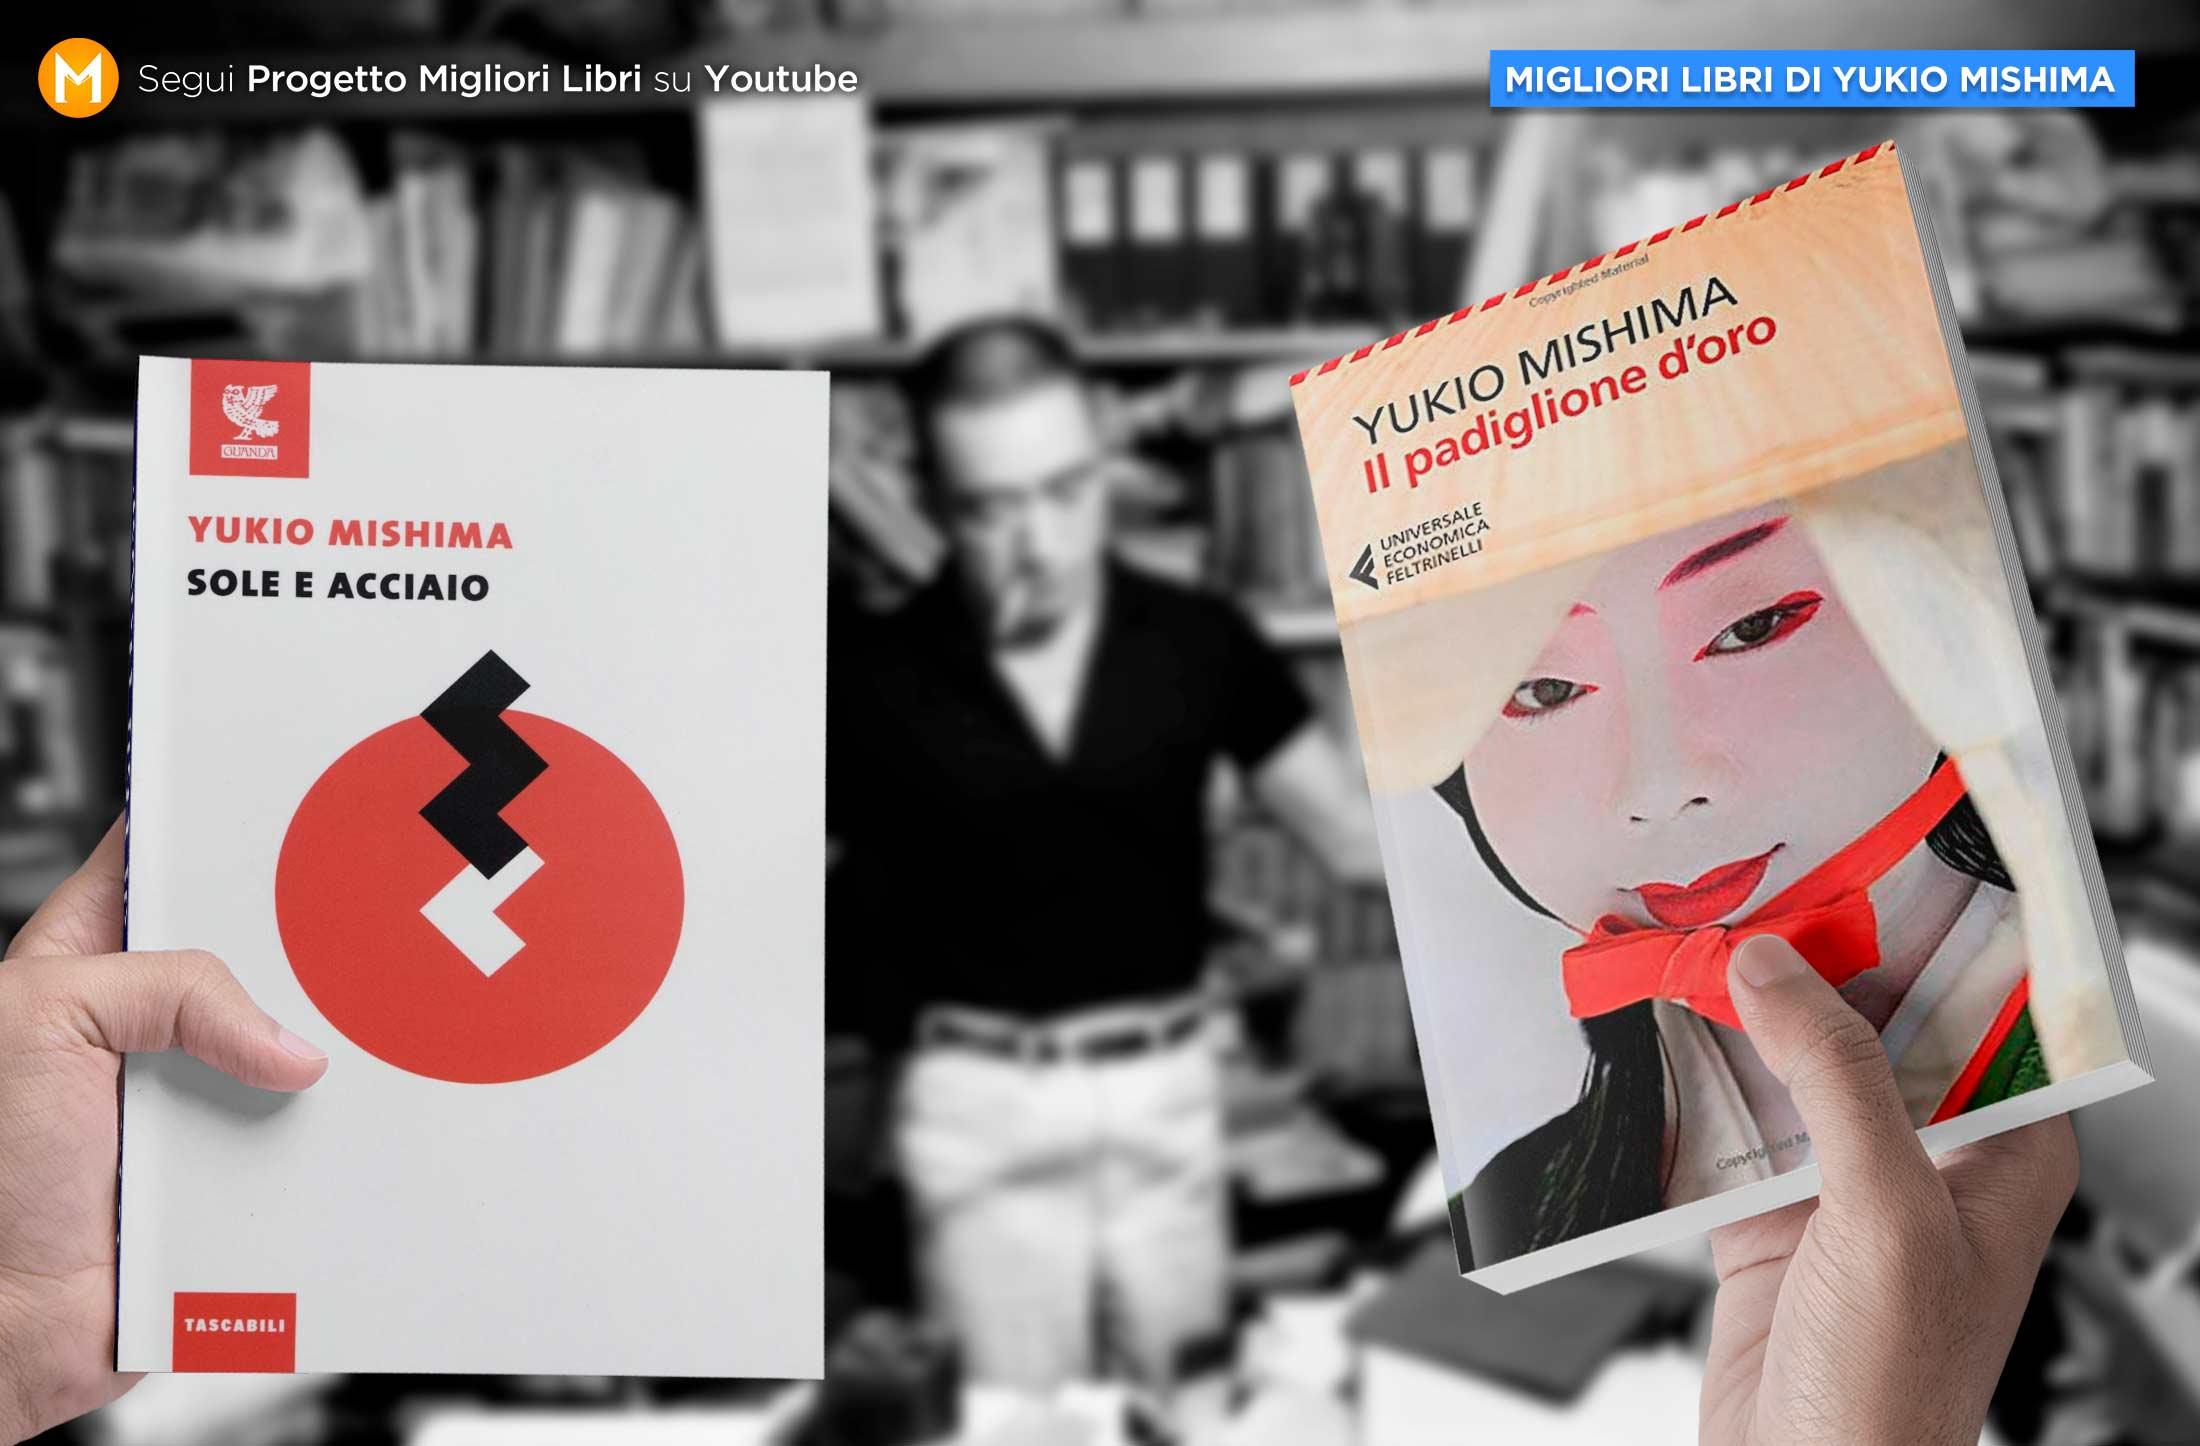 migliori-libri-yukio-mishima